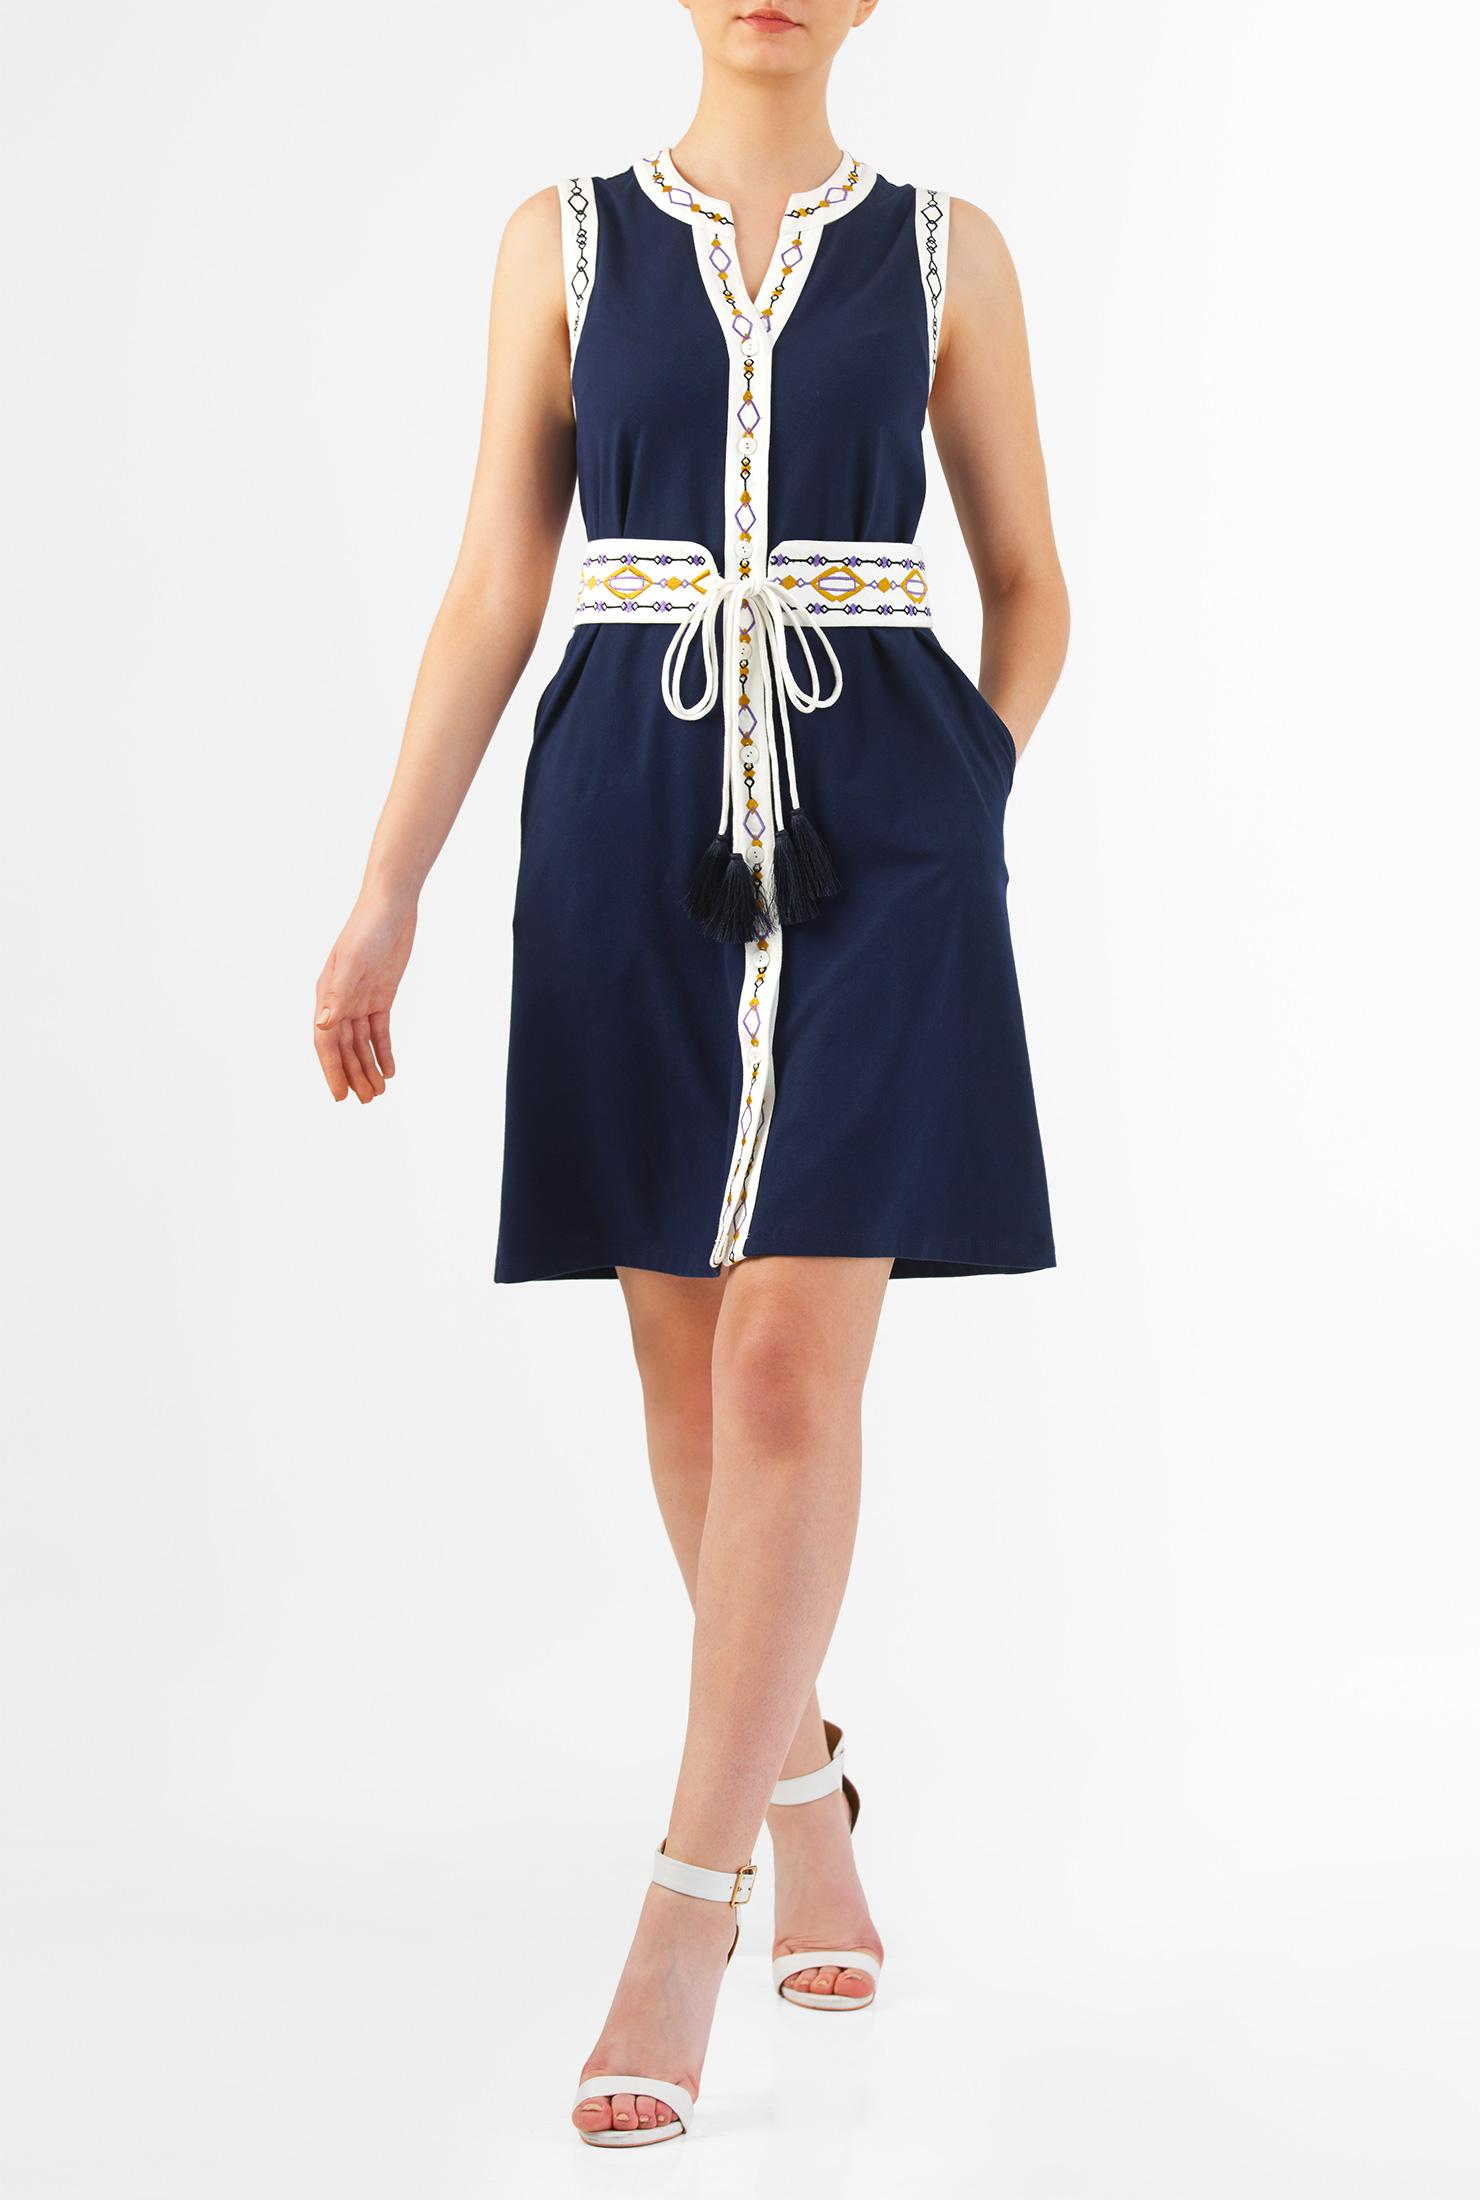 Eshakti Womens Graphic Embellished Tie Belt Cotton Knit Shirtdress